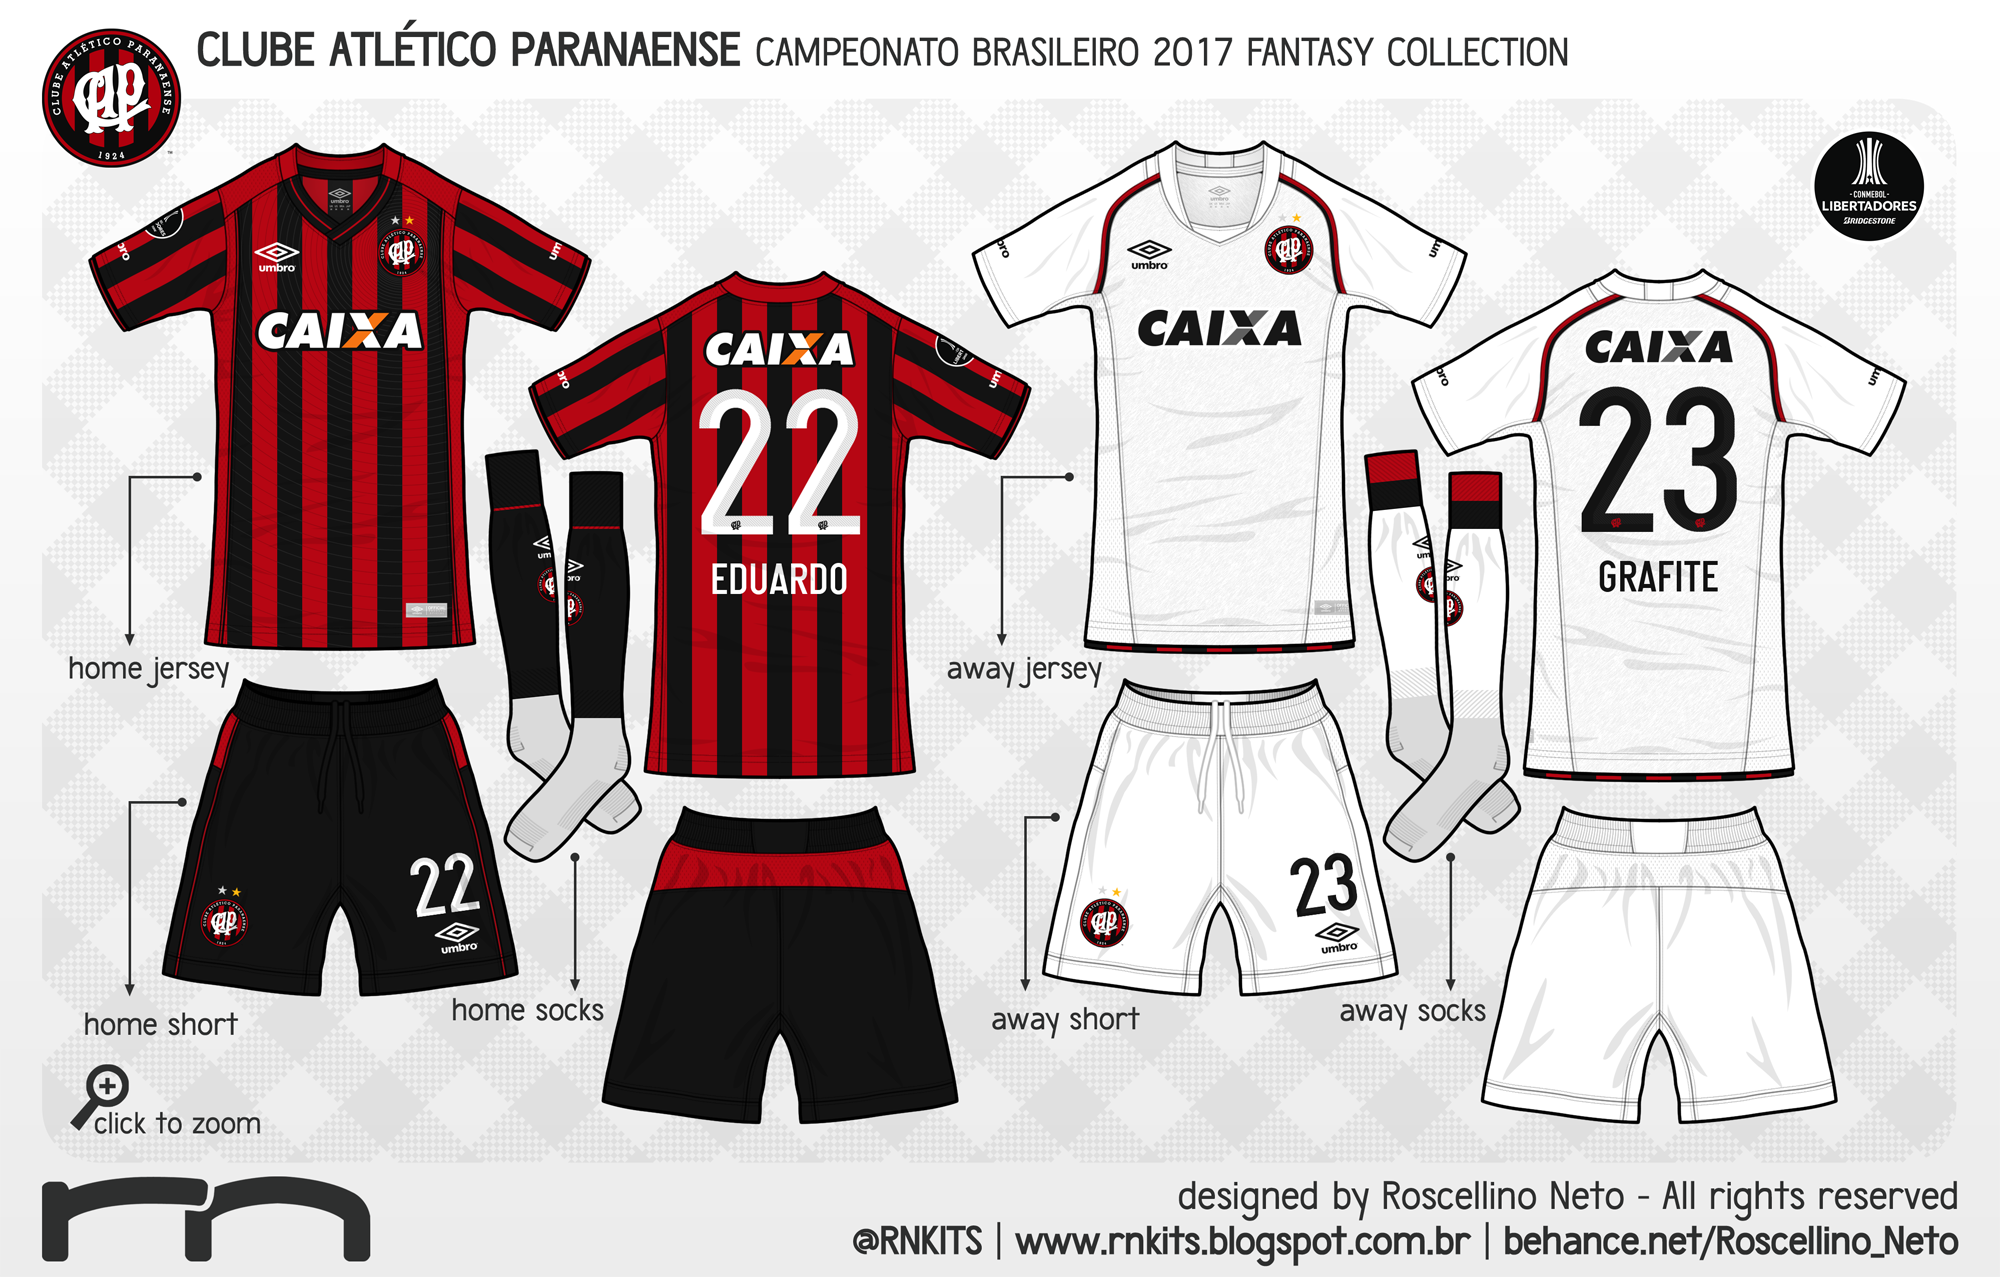 RN Kits  Projeto Campeonato Brasileiro 2017 622f5a143fdd4